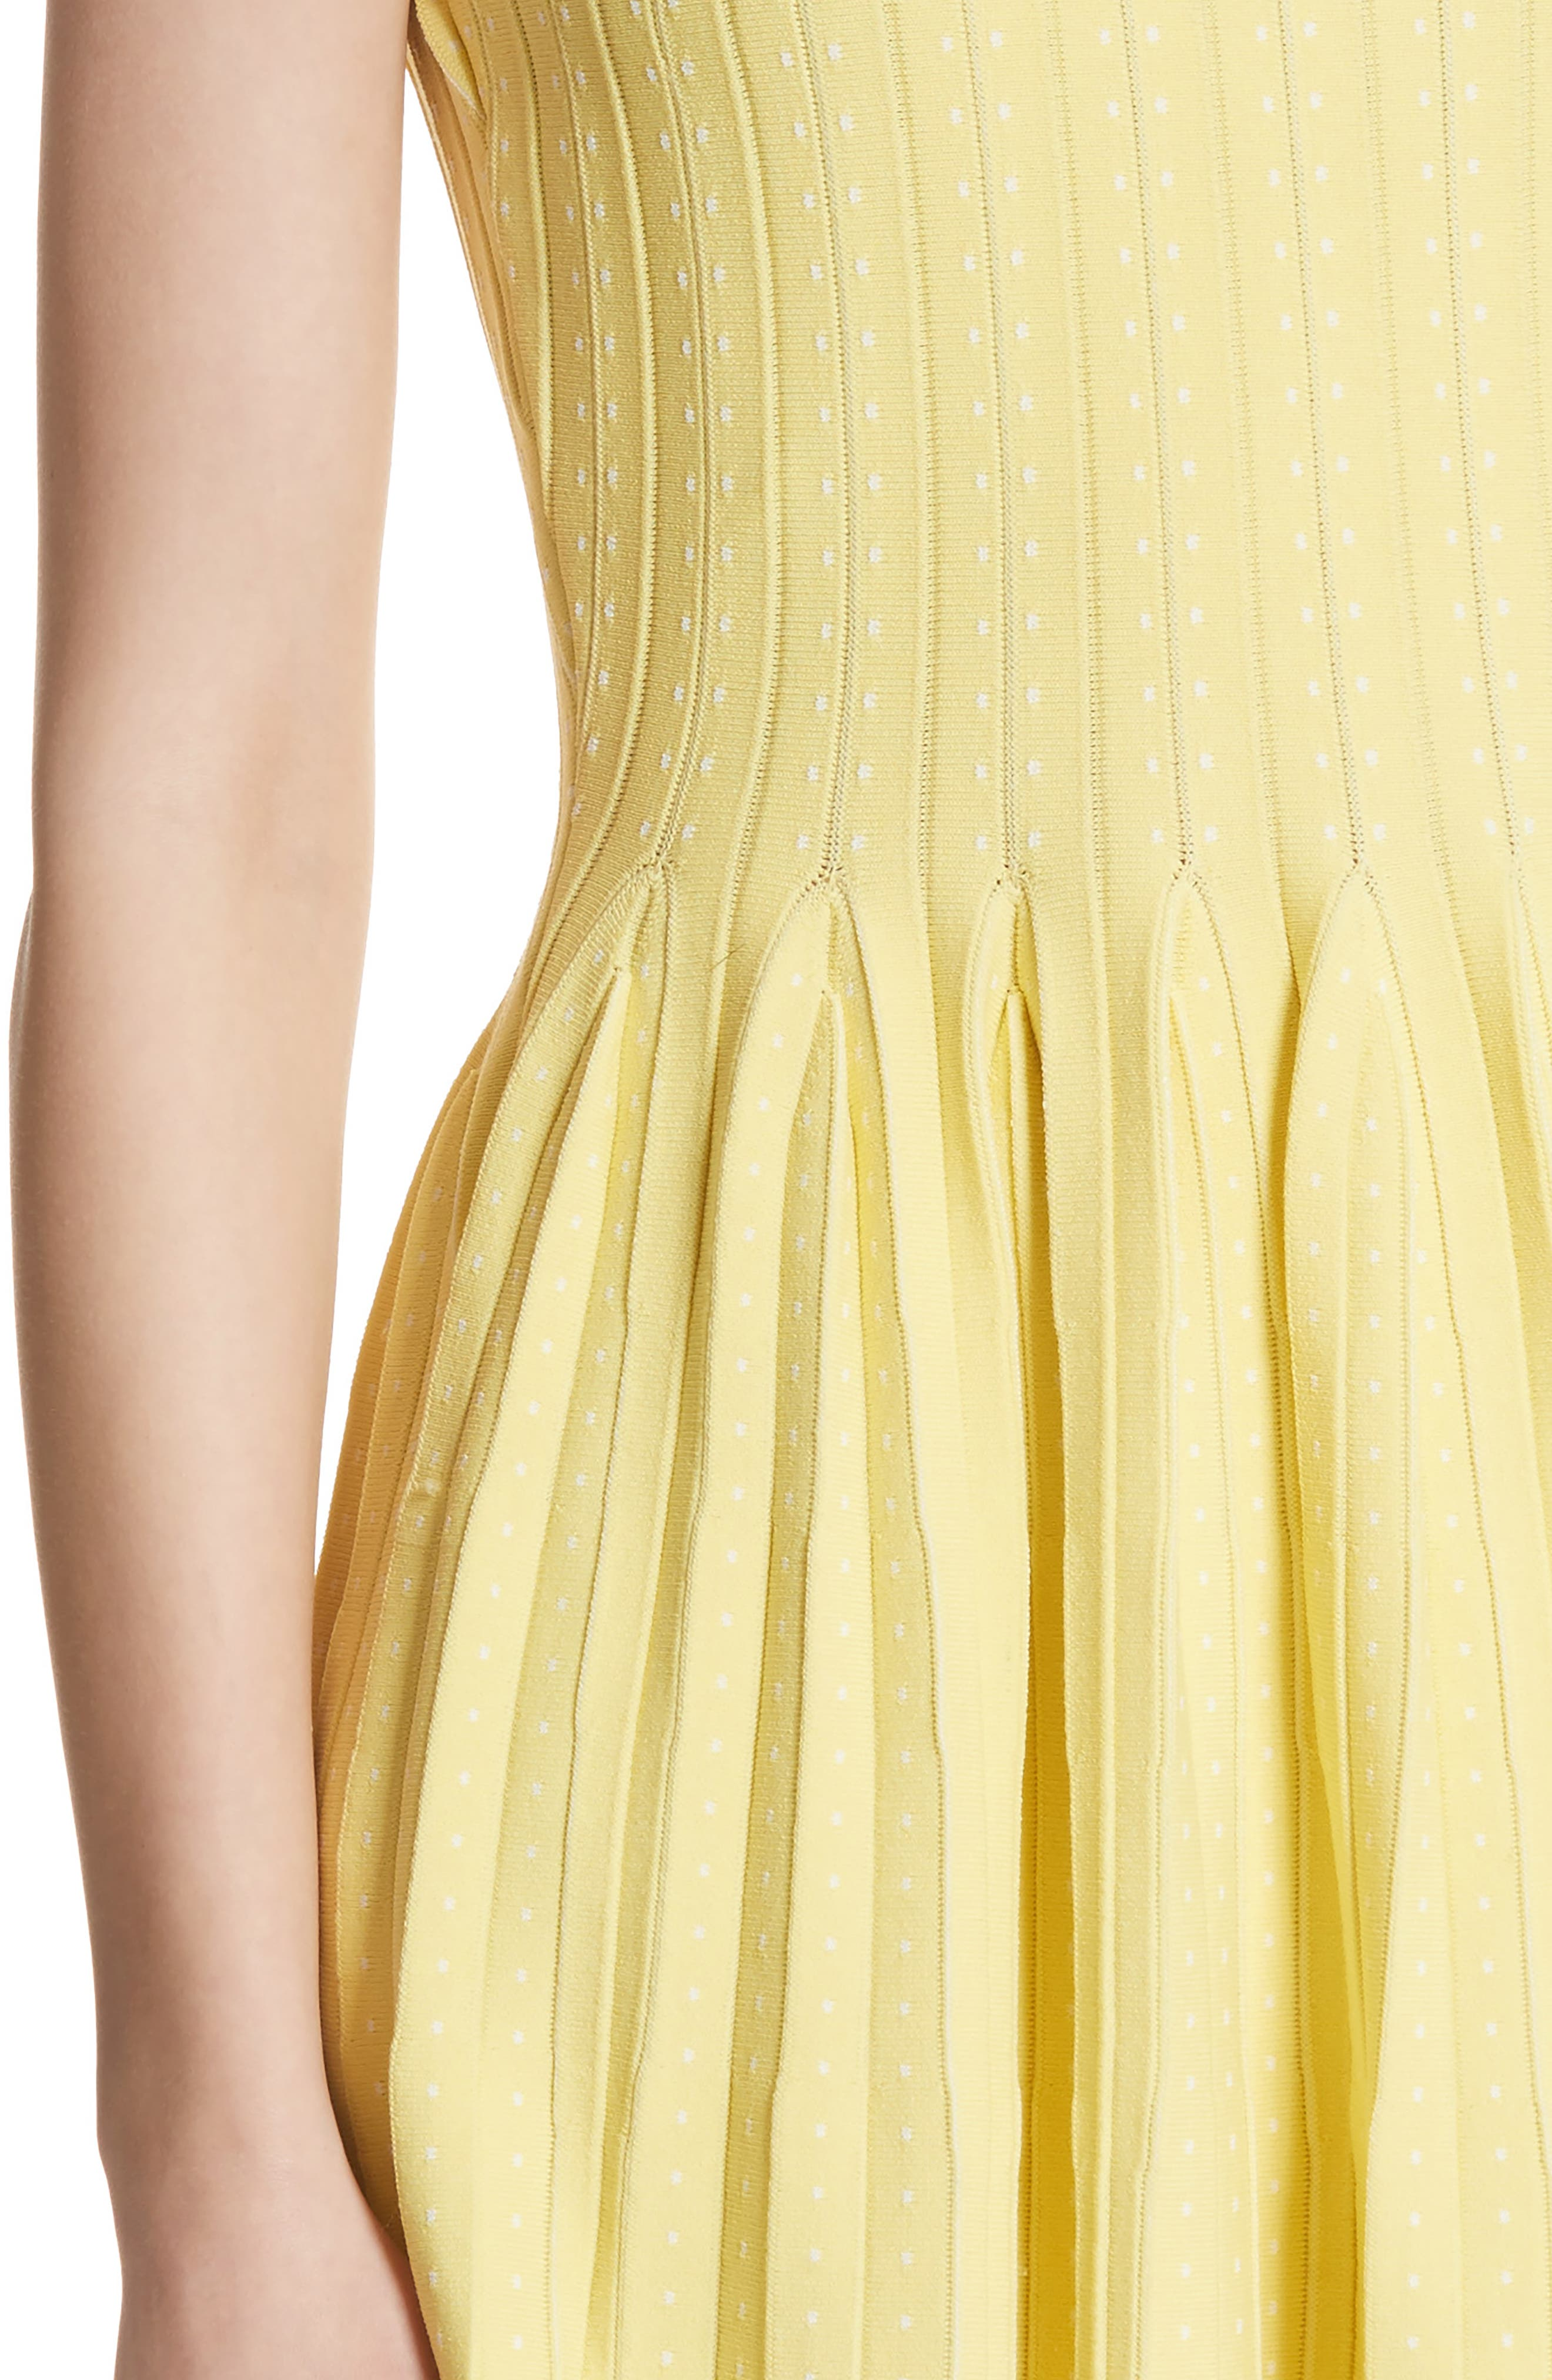 Dot Pleat Fit & Flare Dress,                             Alternate thumbnail 4, color,                             LEMON/ WHITE